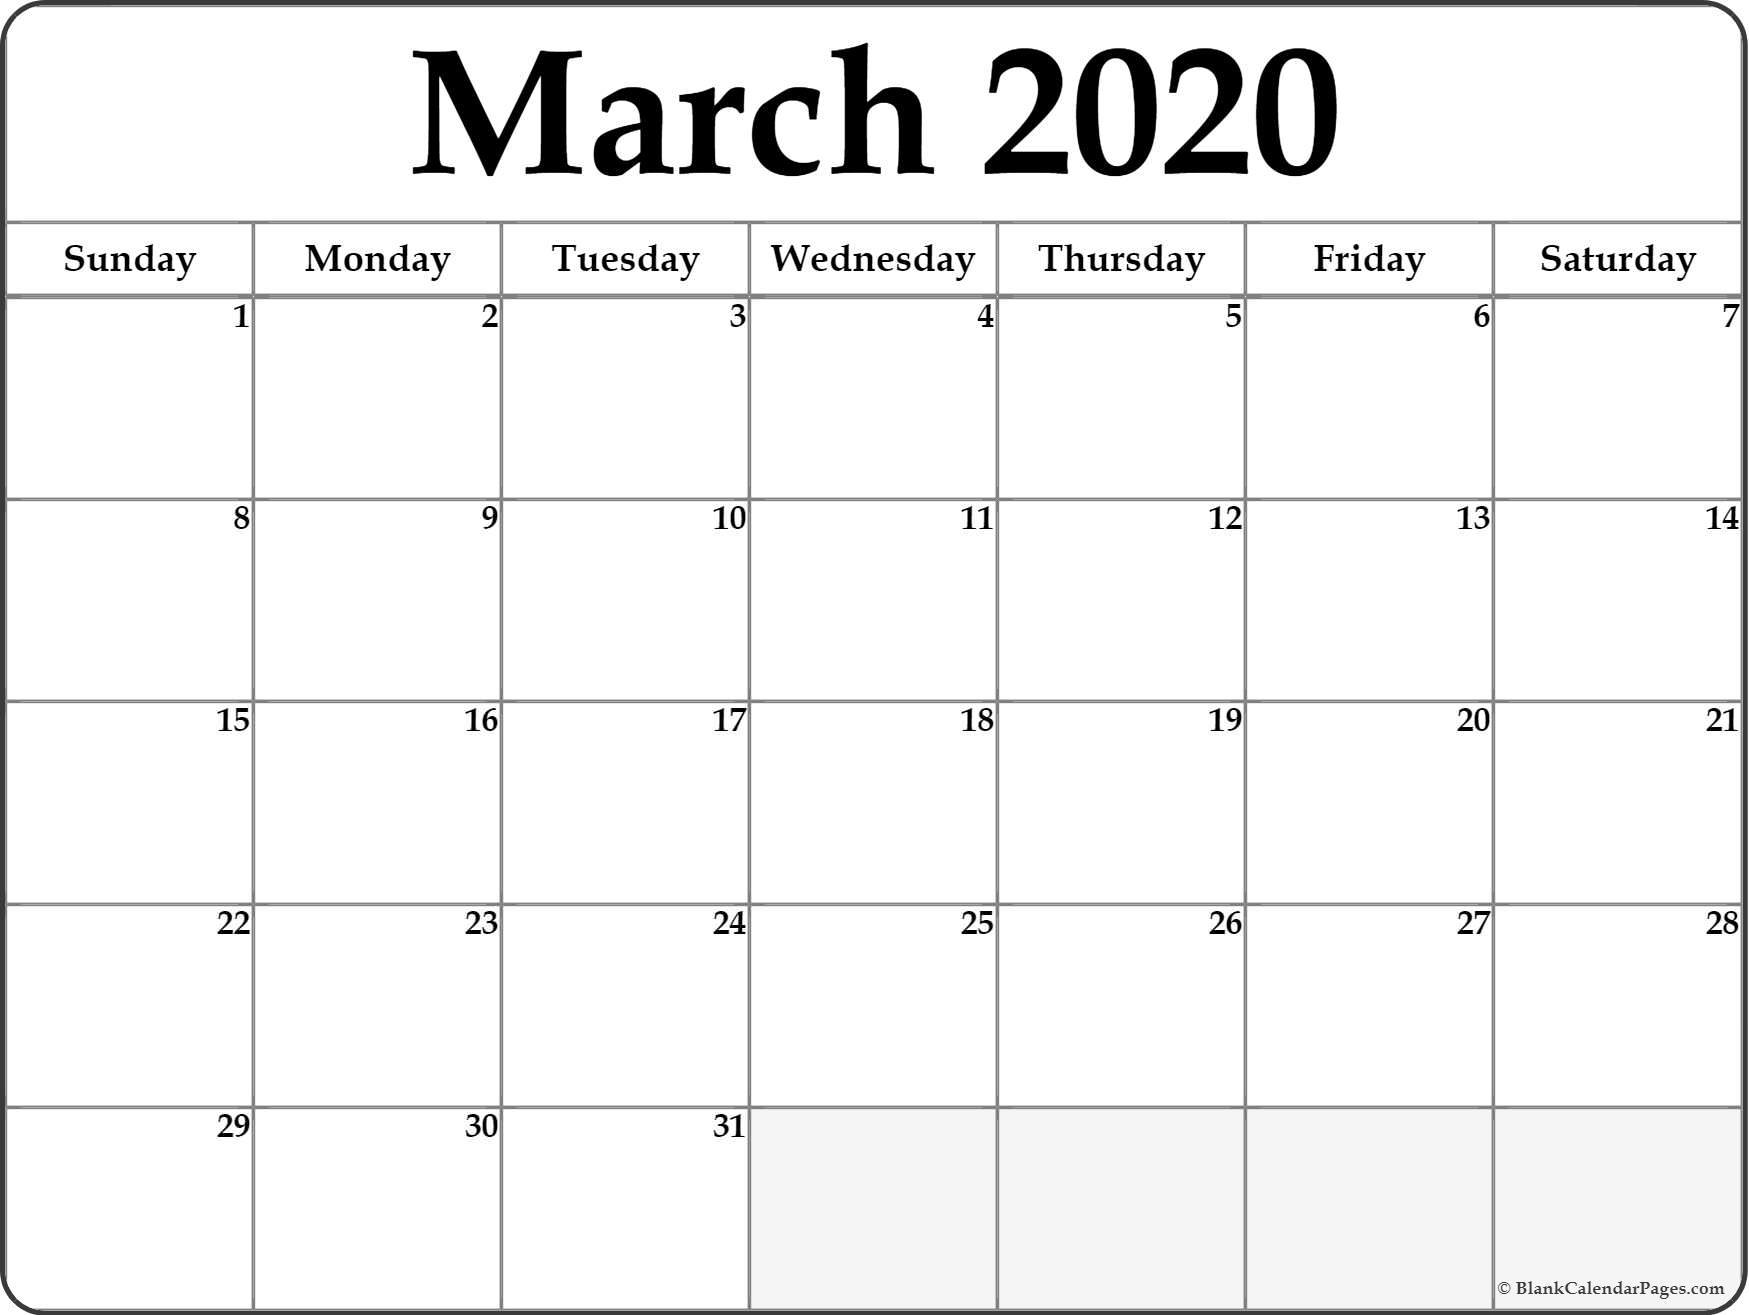 March 2020 Blank Calendar - Temusi